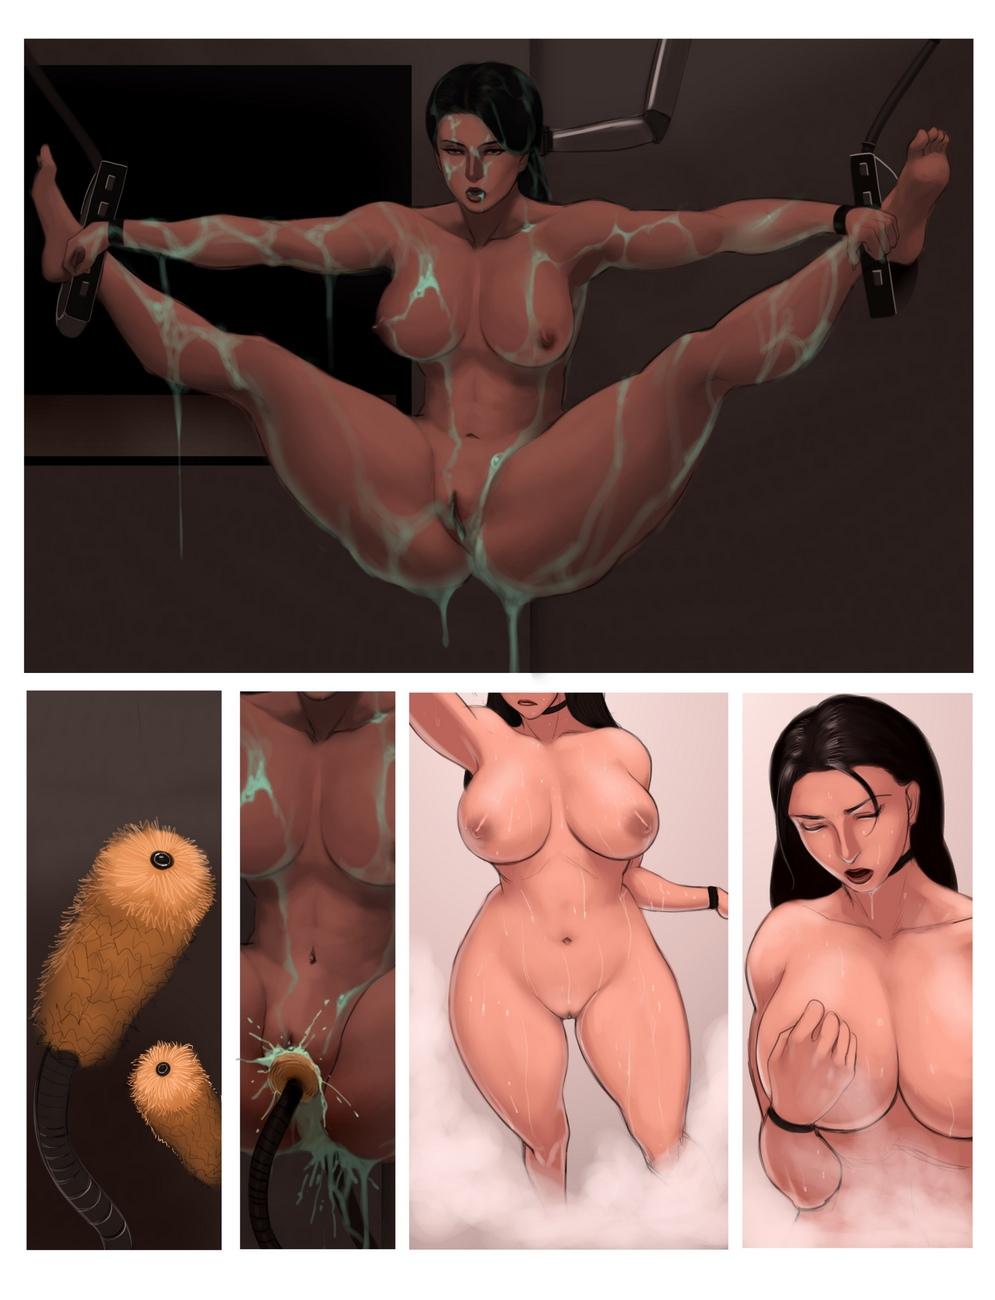 Transformation Hentai Games